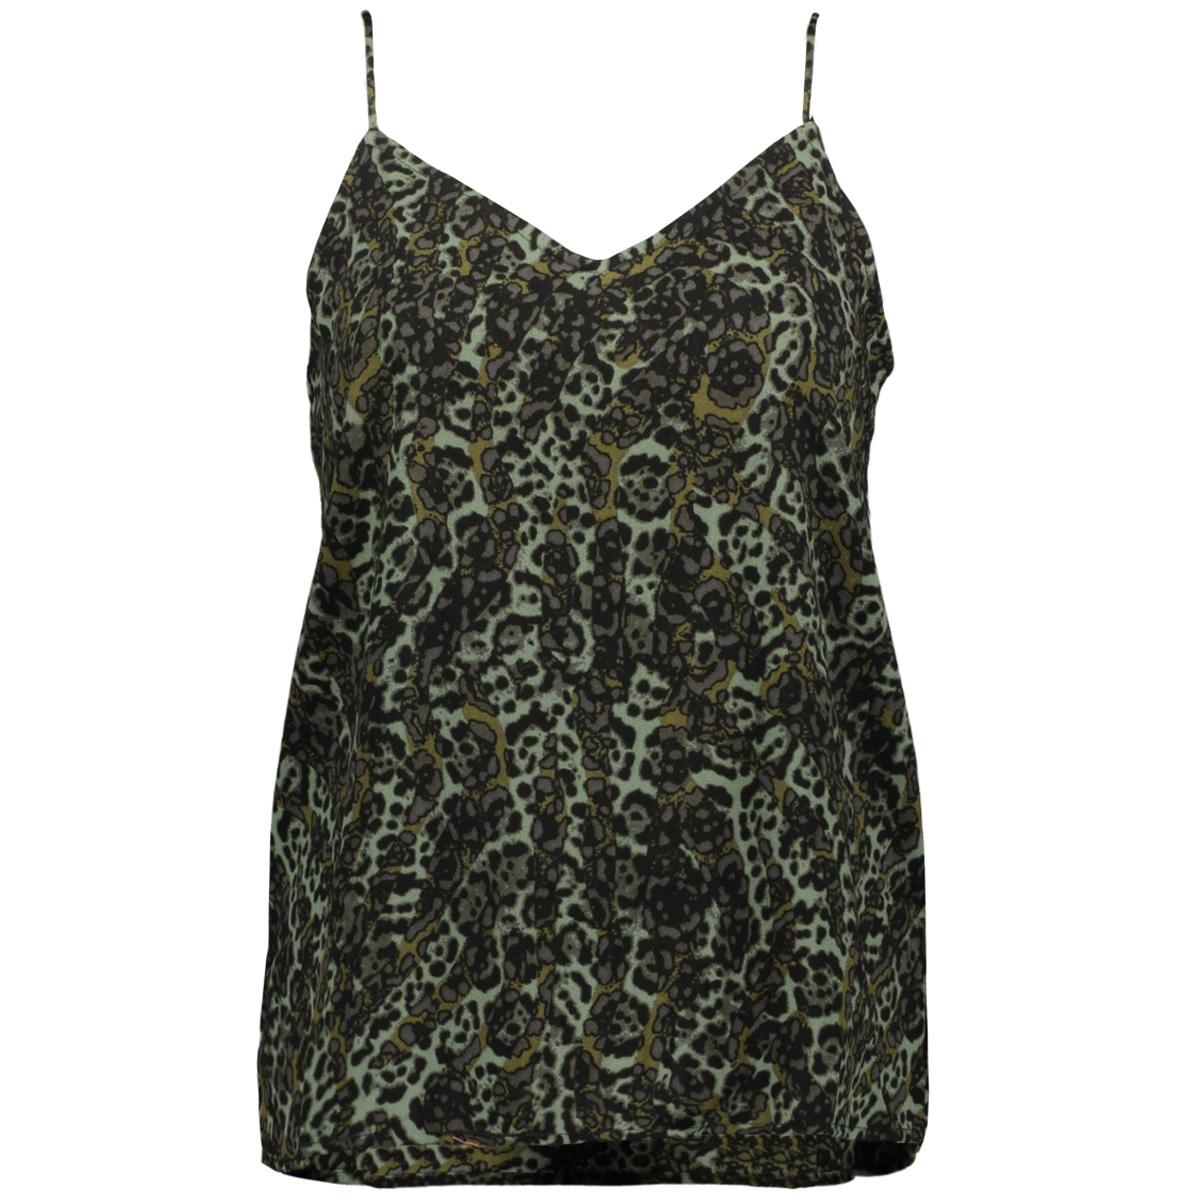 vmistanbul singlet vip 10223596 vero moda top ivy green/petra